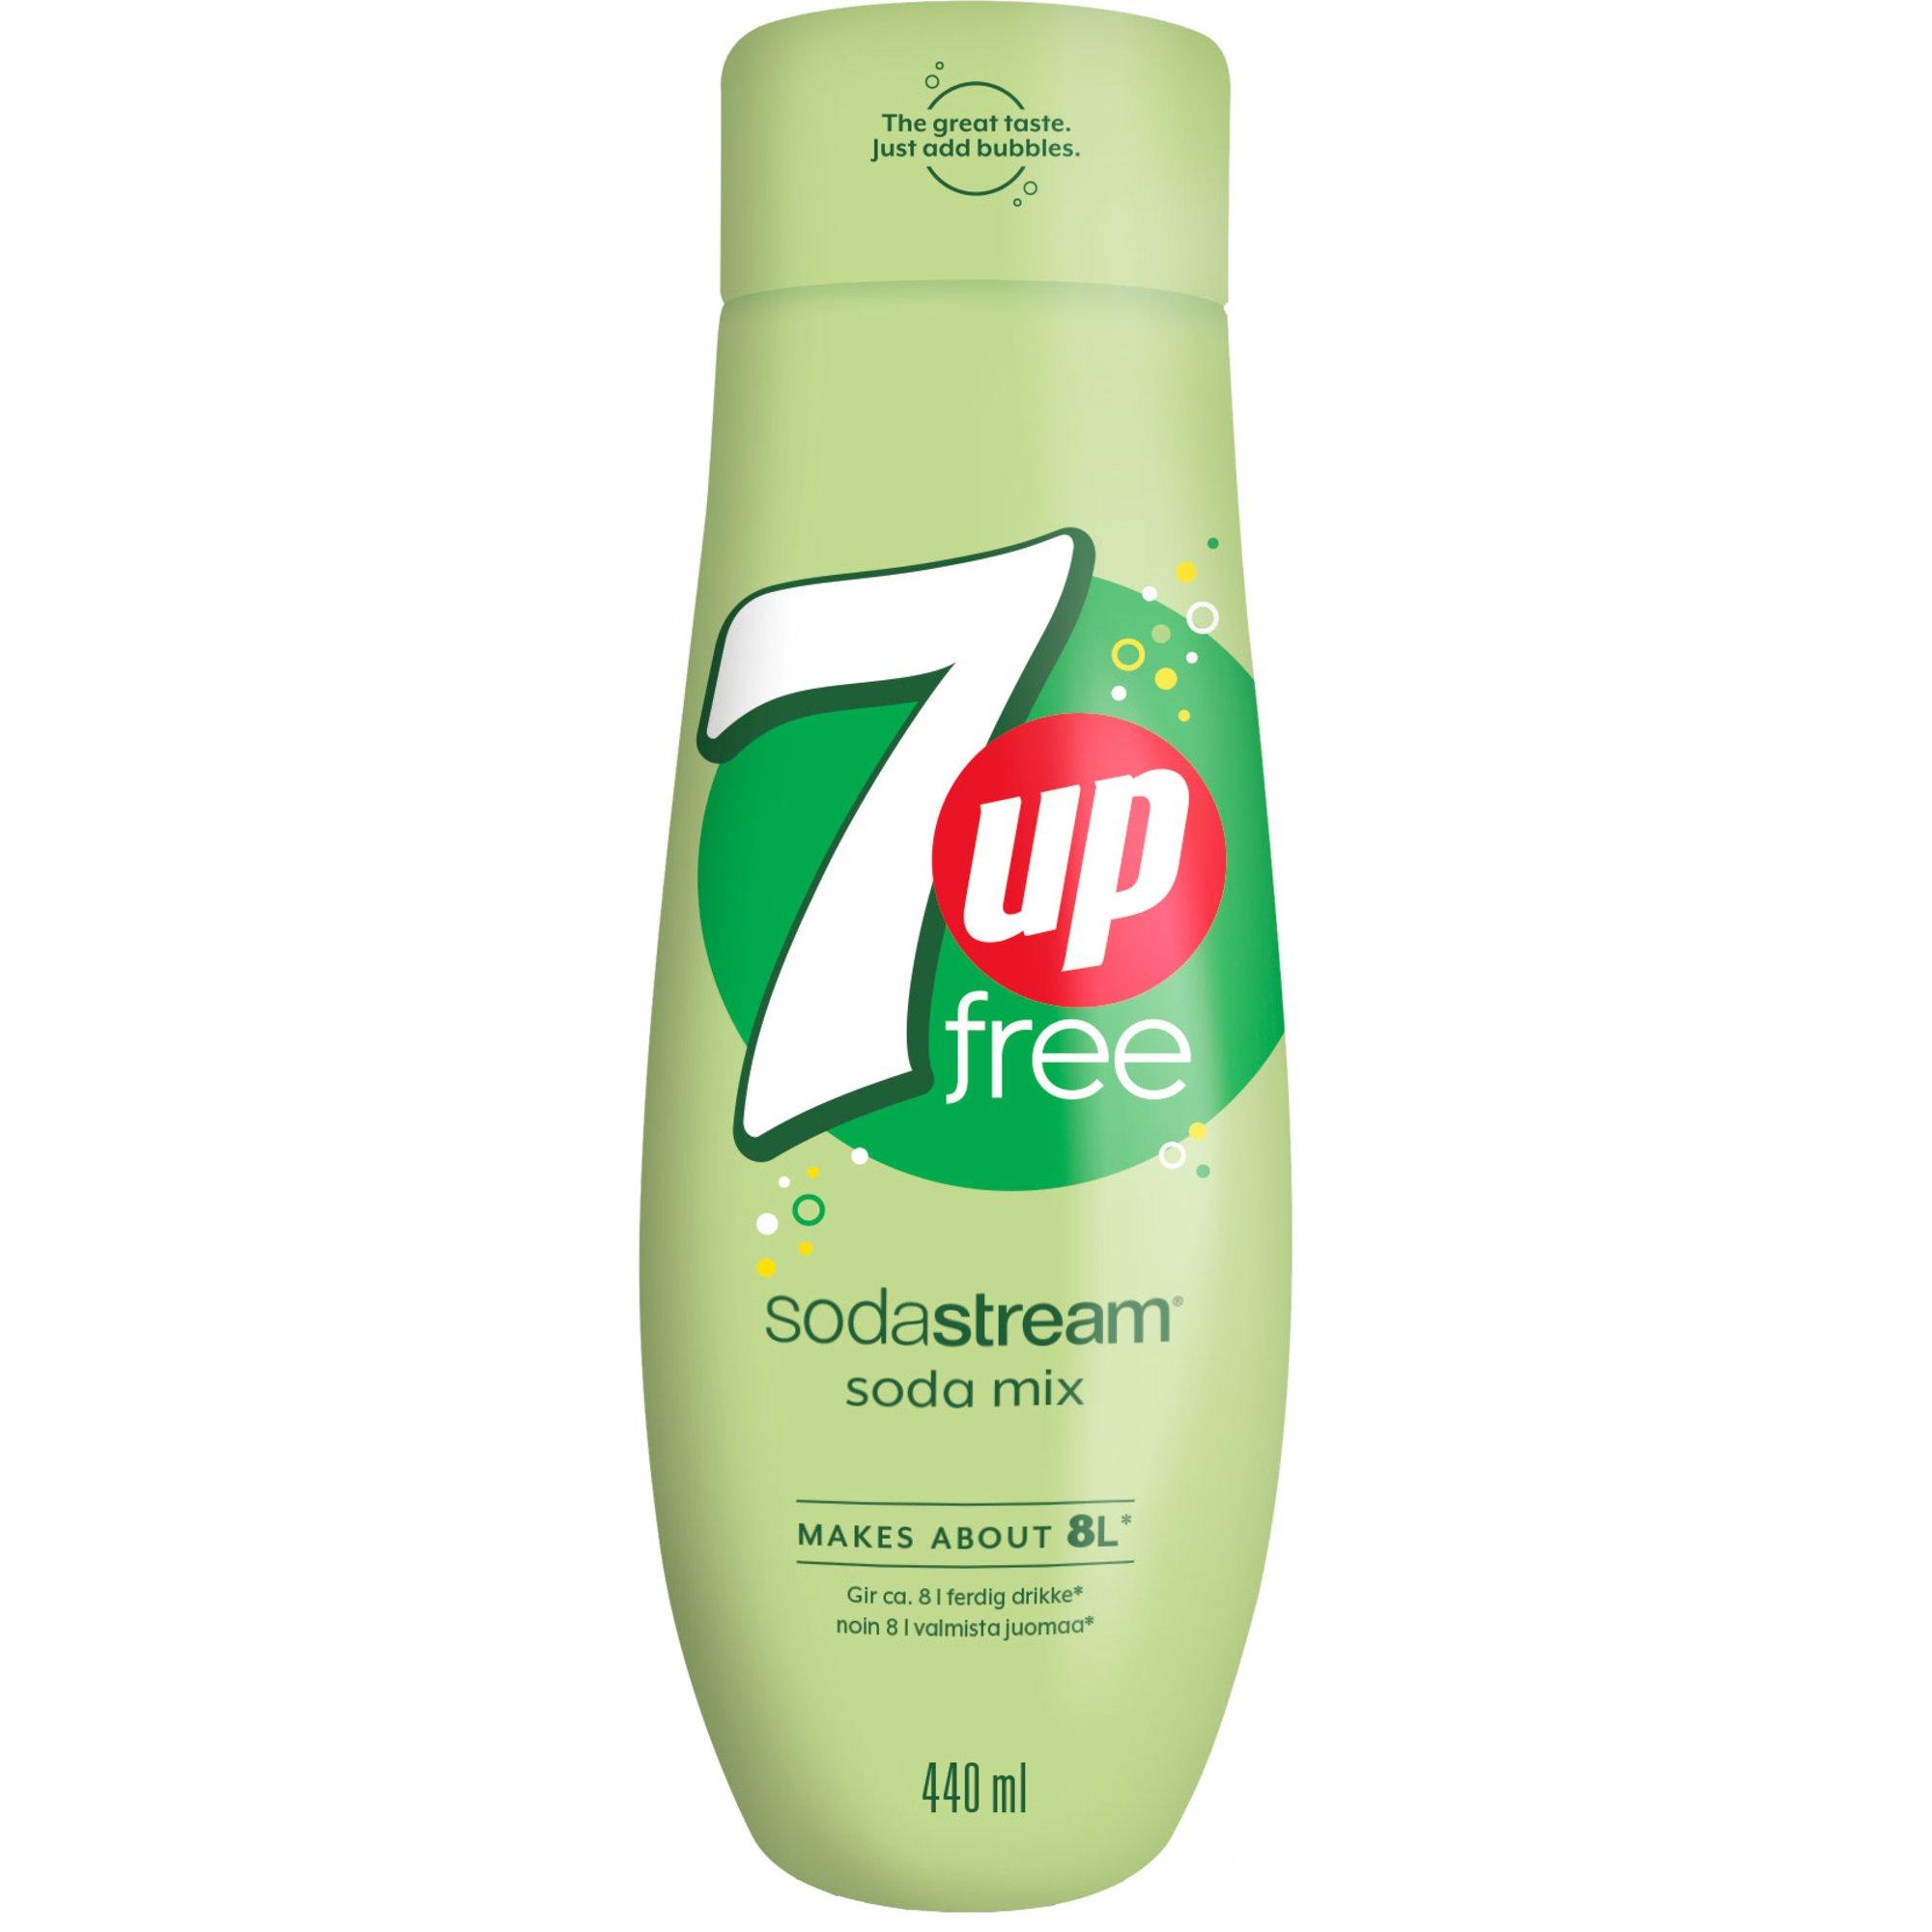 SodaStream 7UP Free Smakkoncentrat 440ml